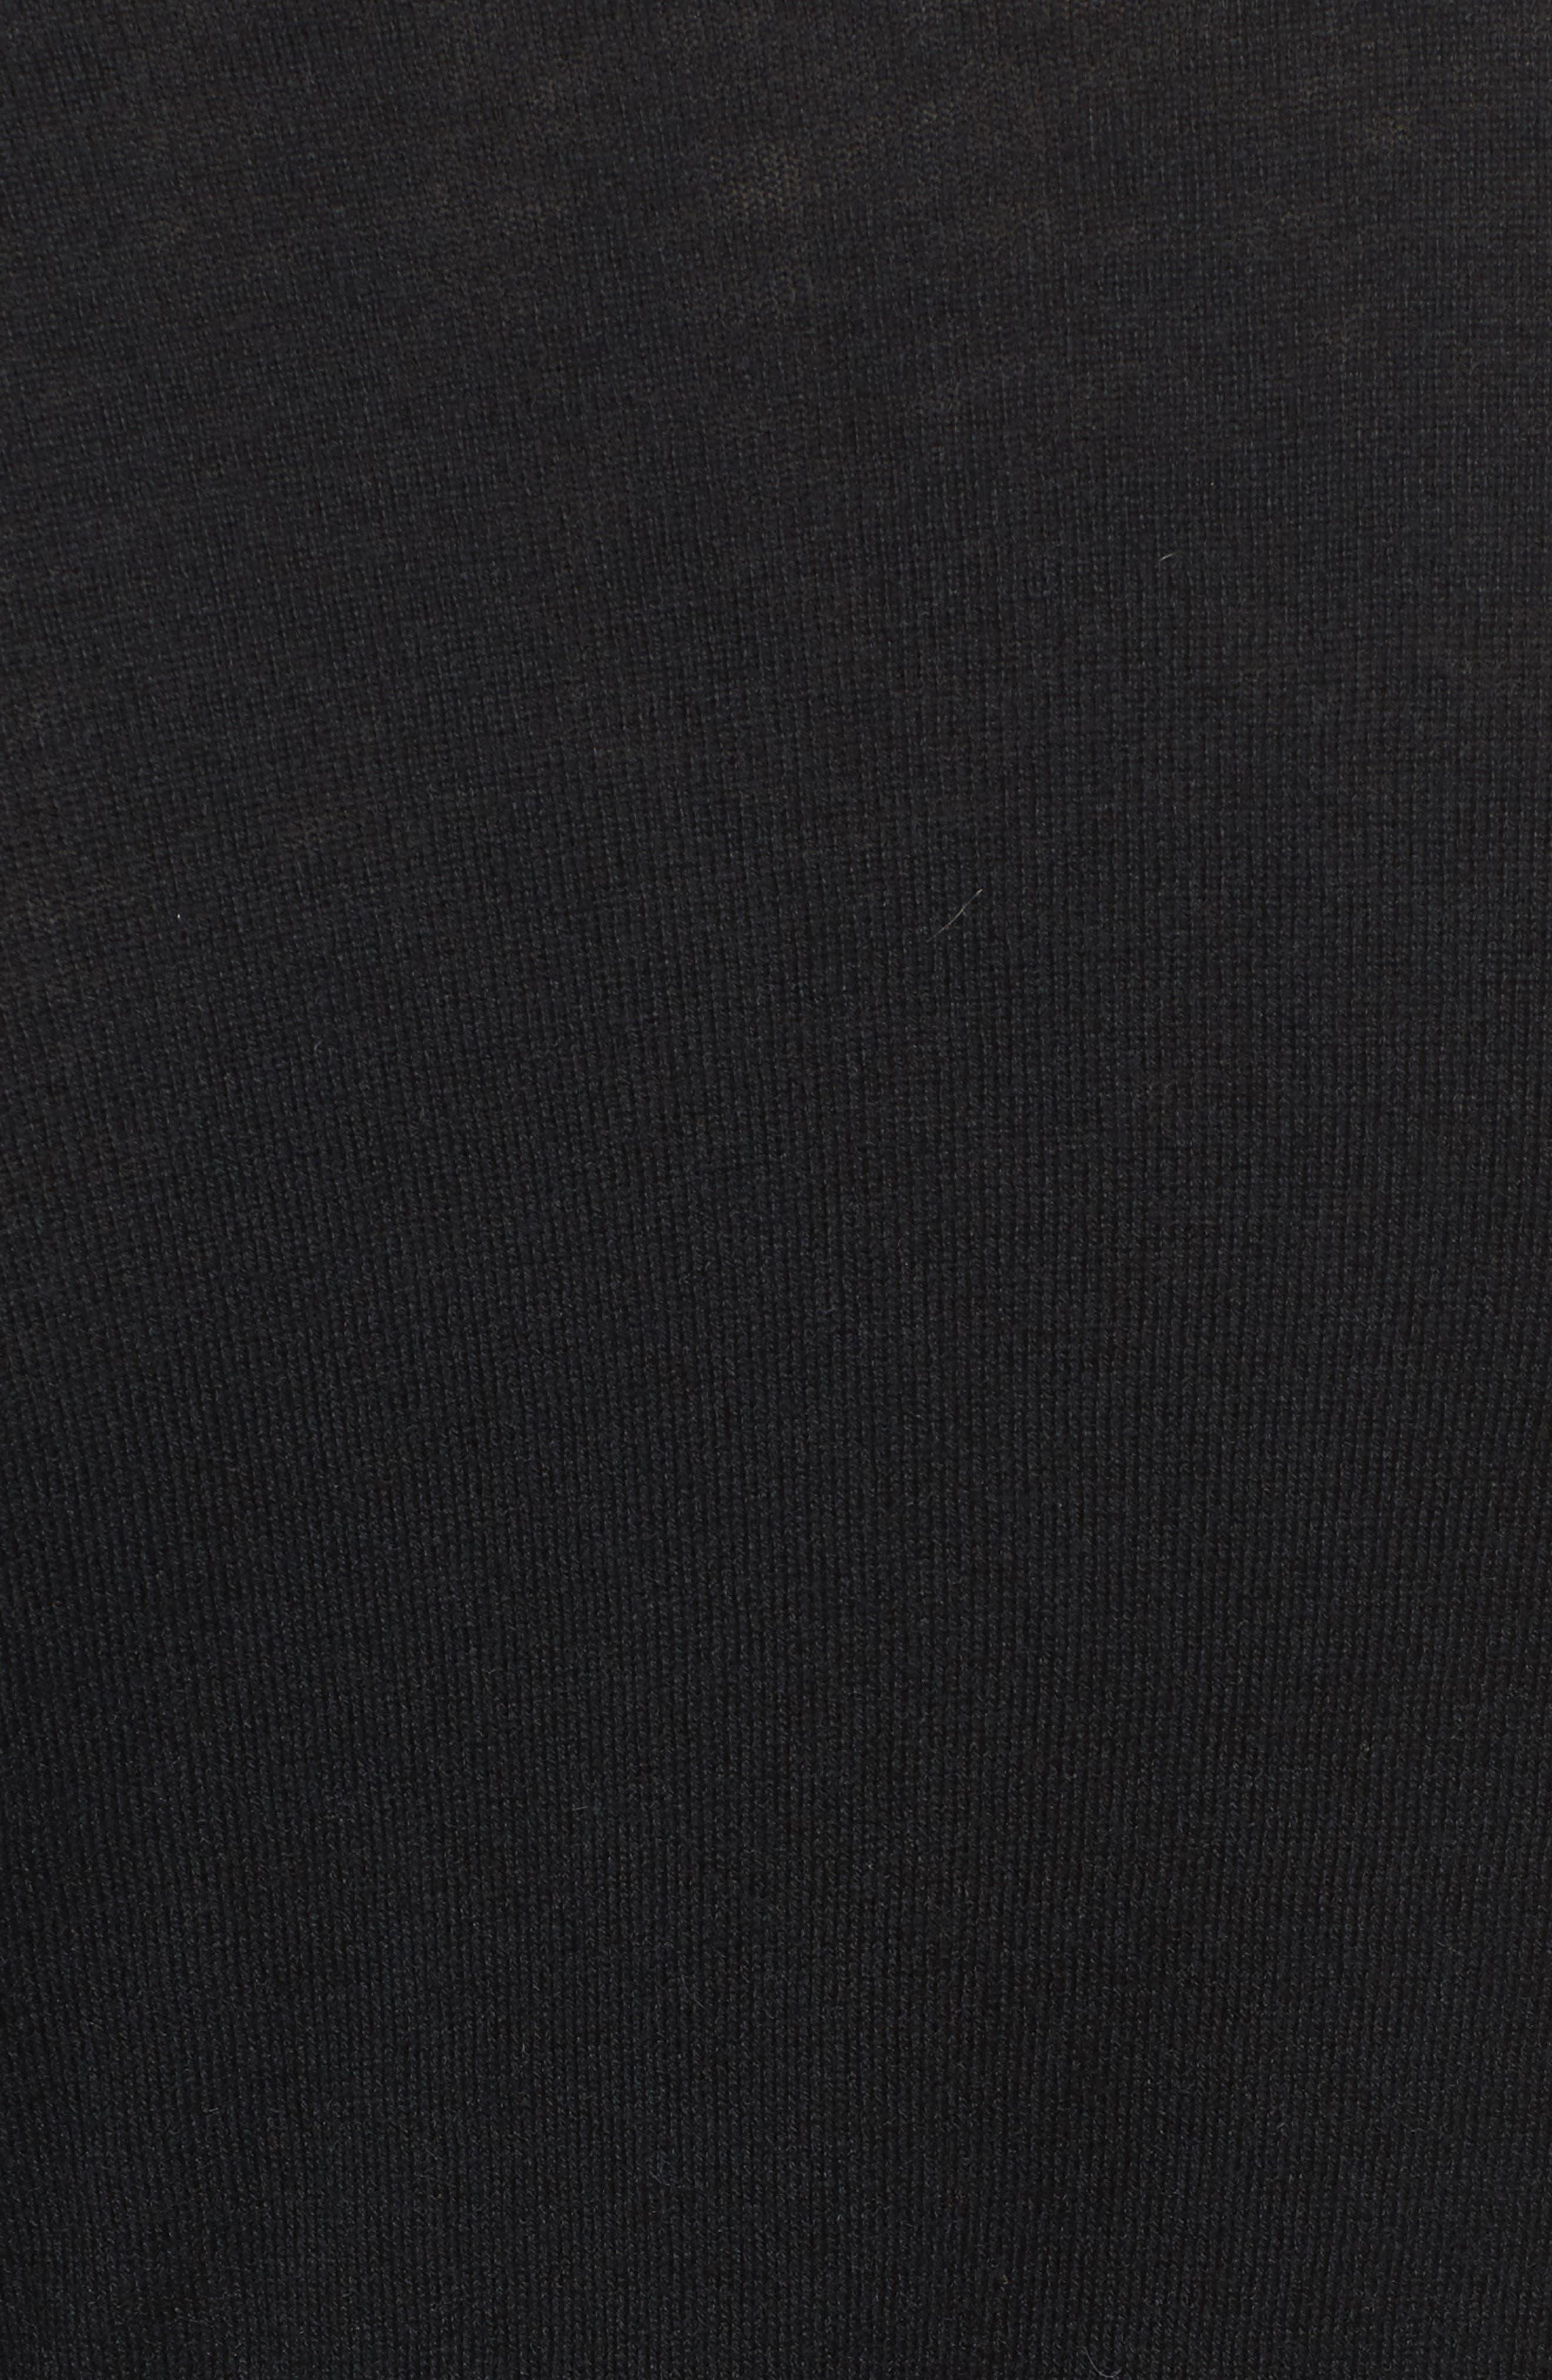 Ballet Wrap Sweater,                             Alternate thumbnail 5, color,                             Black